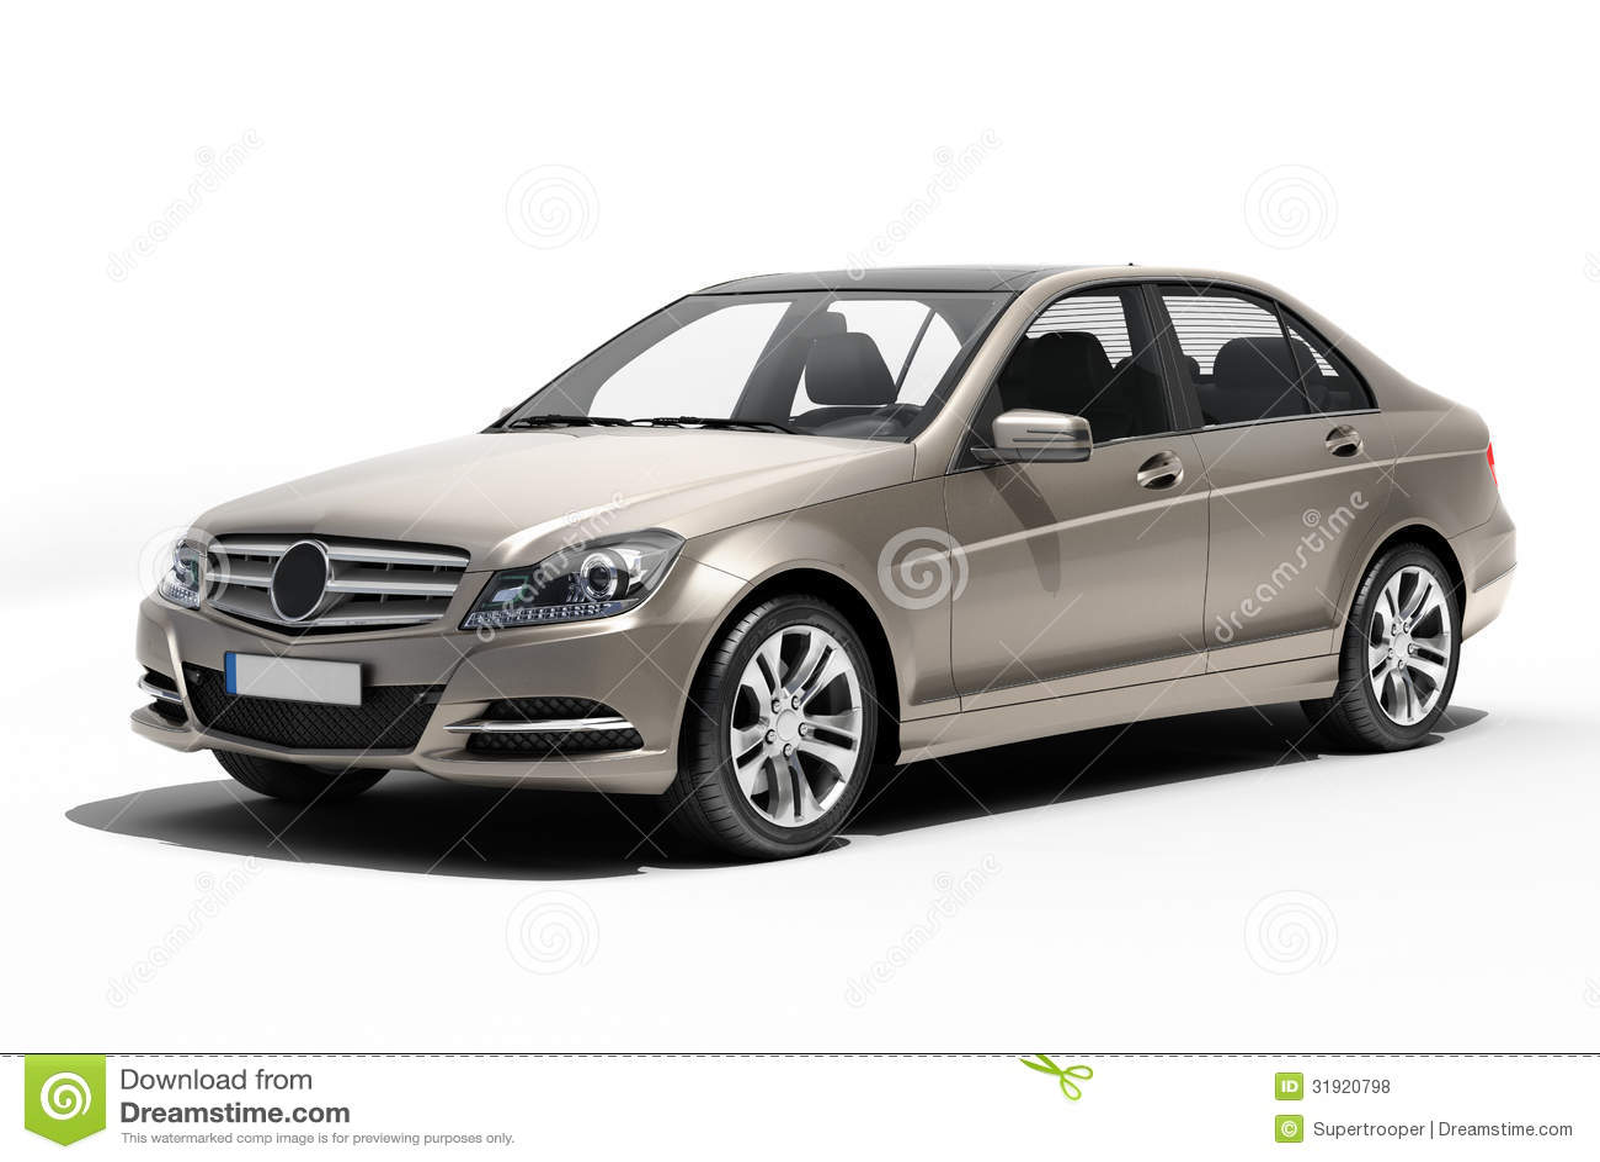 Contemporary Luxury Car Isolated Royalty Free Stock Photos